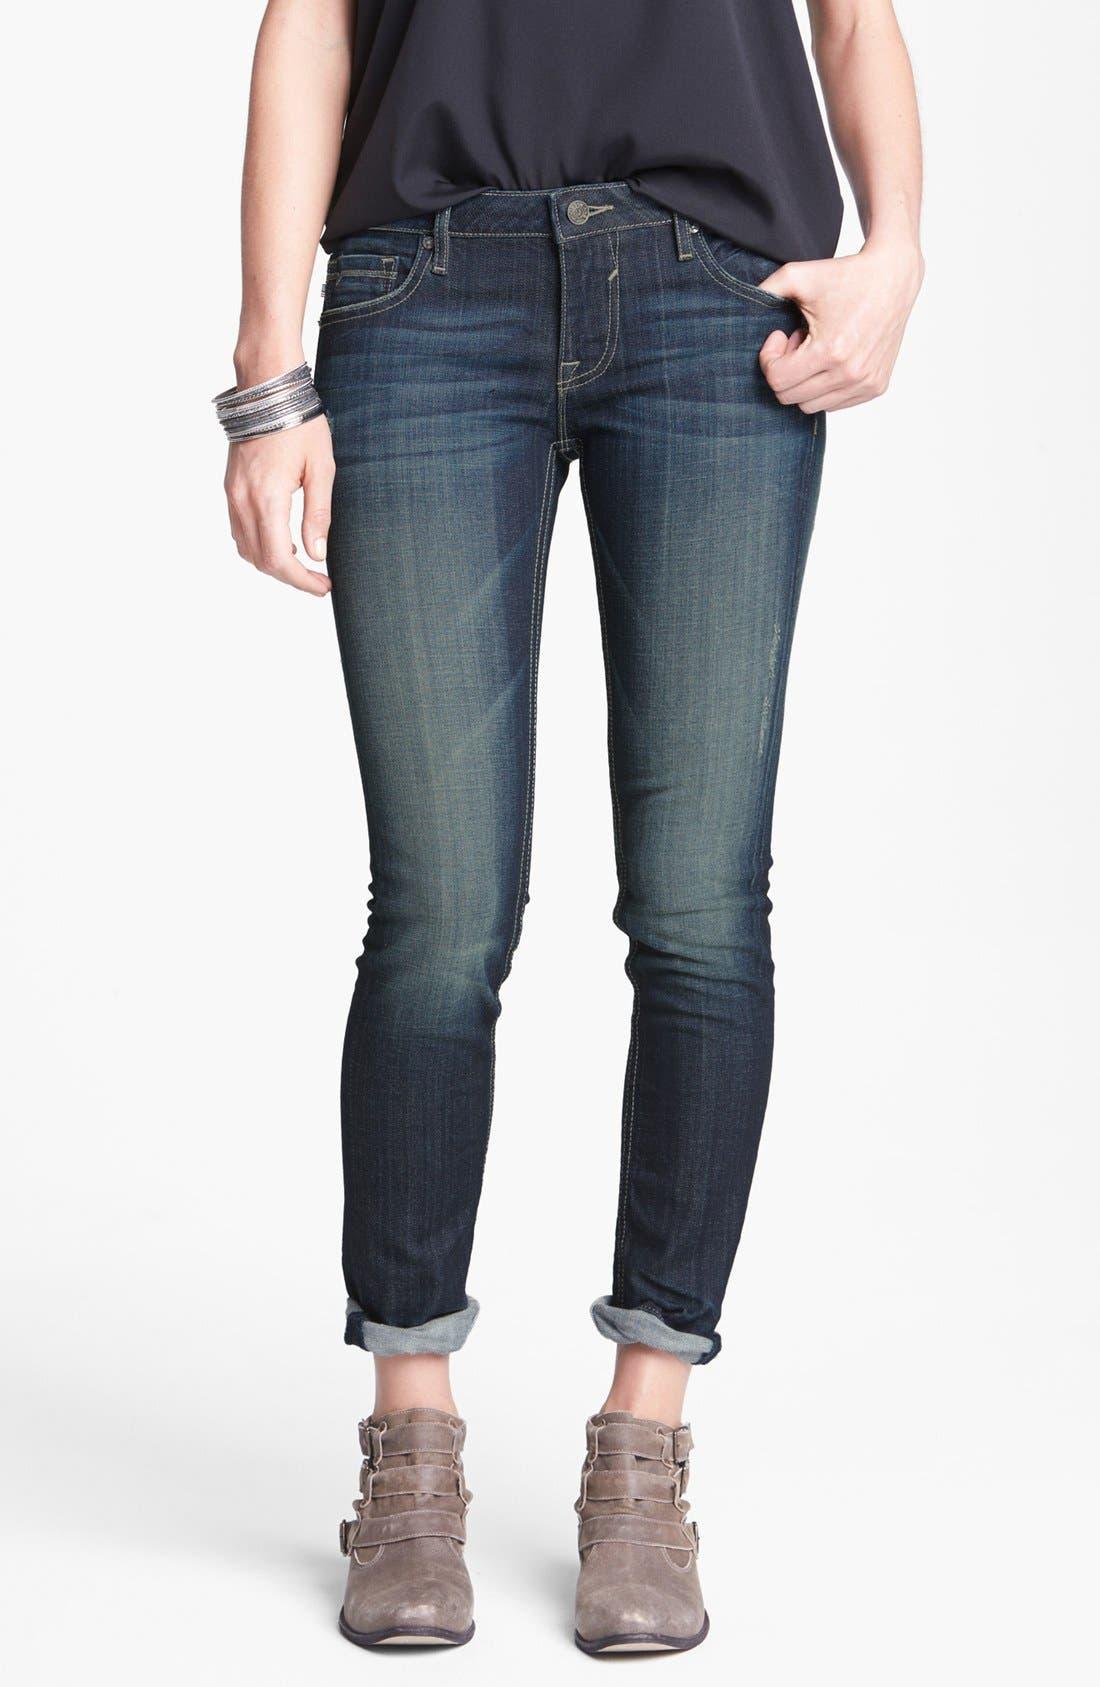 Alternate Image 1 Selected - Vigoss 'Thompson Tomboy' Crop Skinny Boyfriend Jeans (Dark) (Juniors)